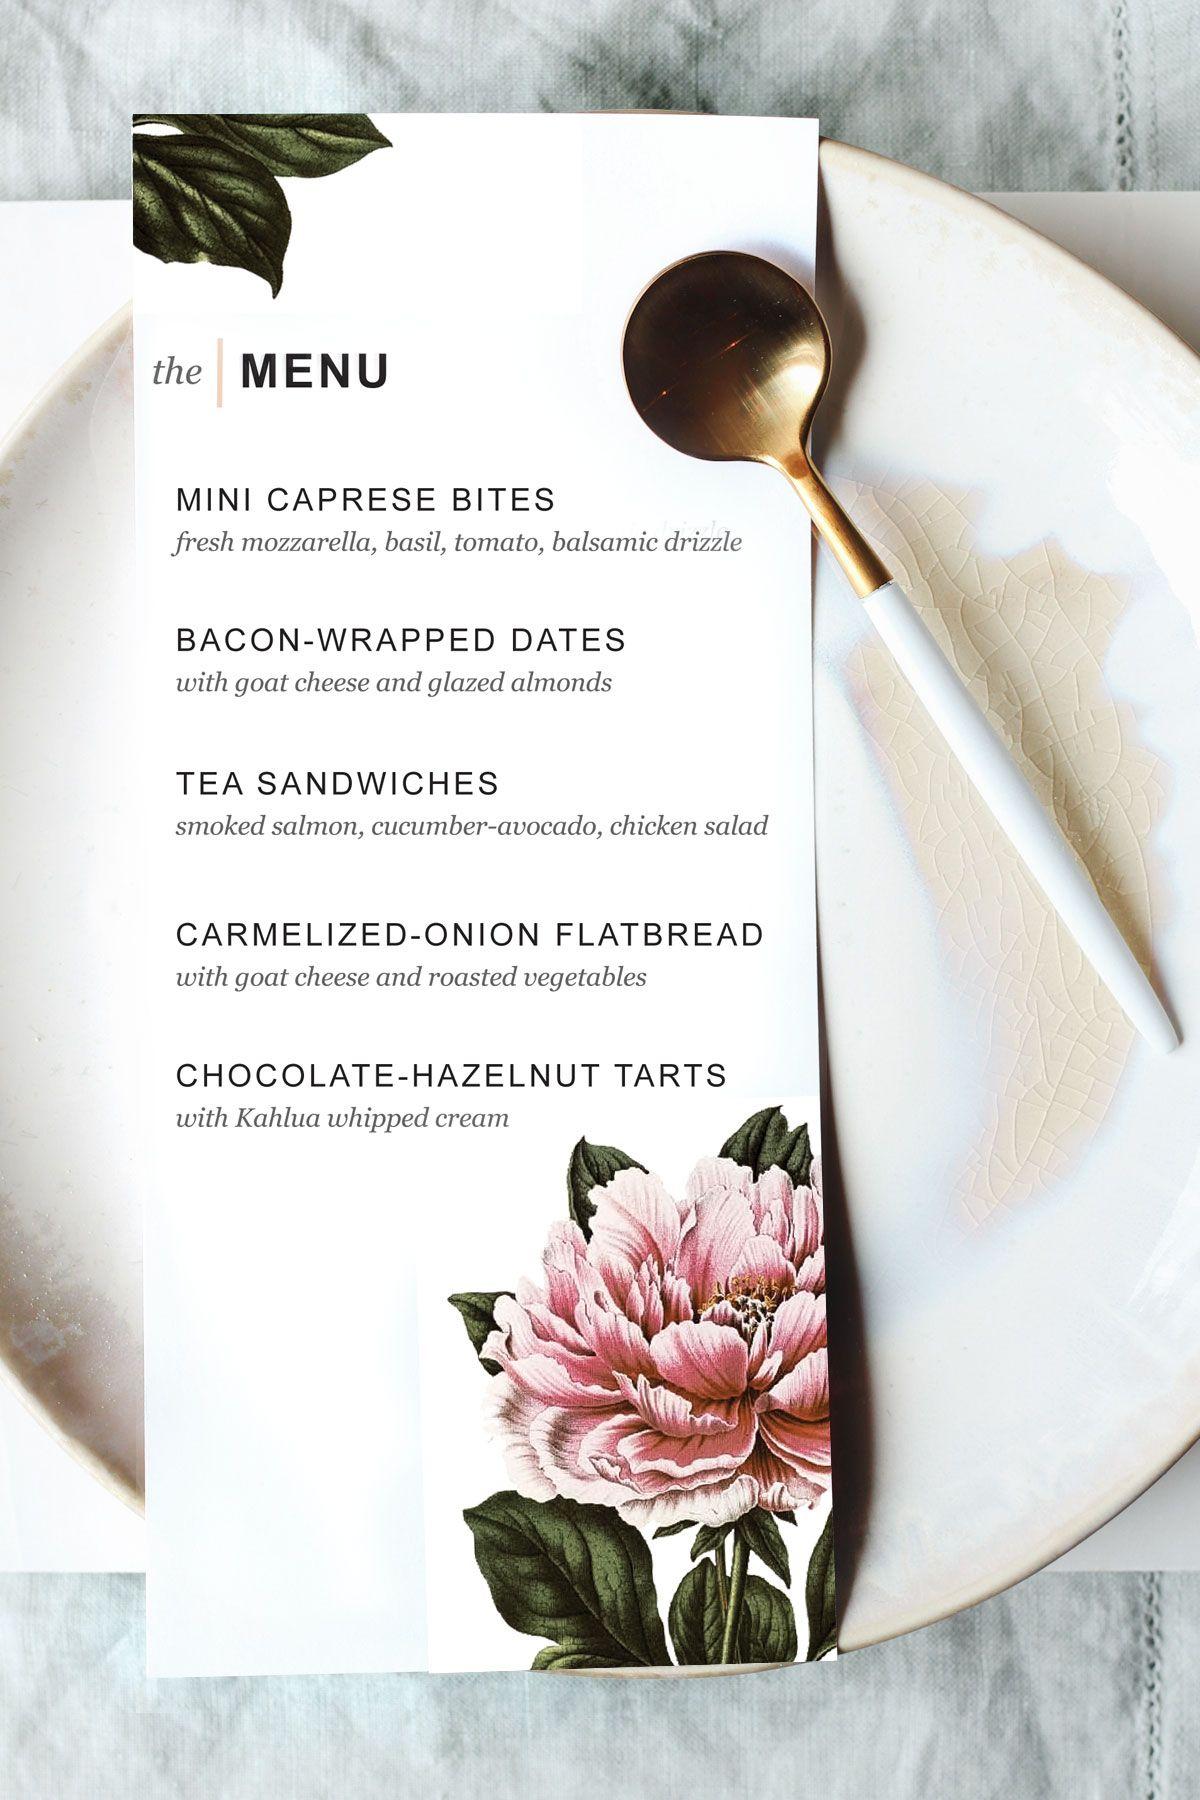 Printable Dinner Party Menu Template   Party Planning   Pinterest - Free Printable Wedding Menu Card Templates